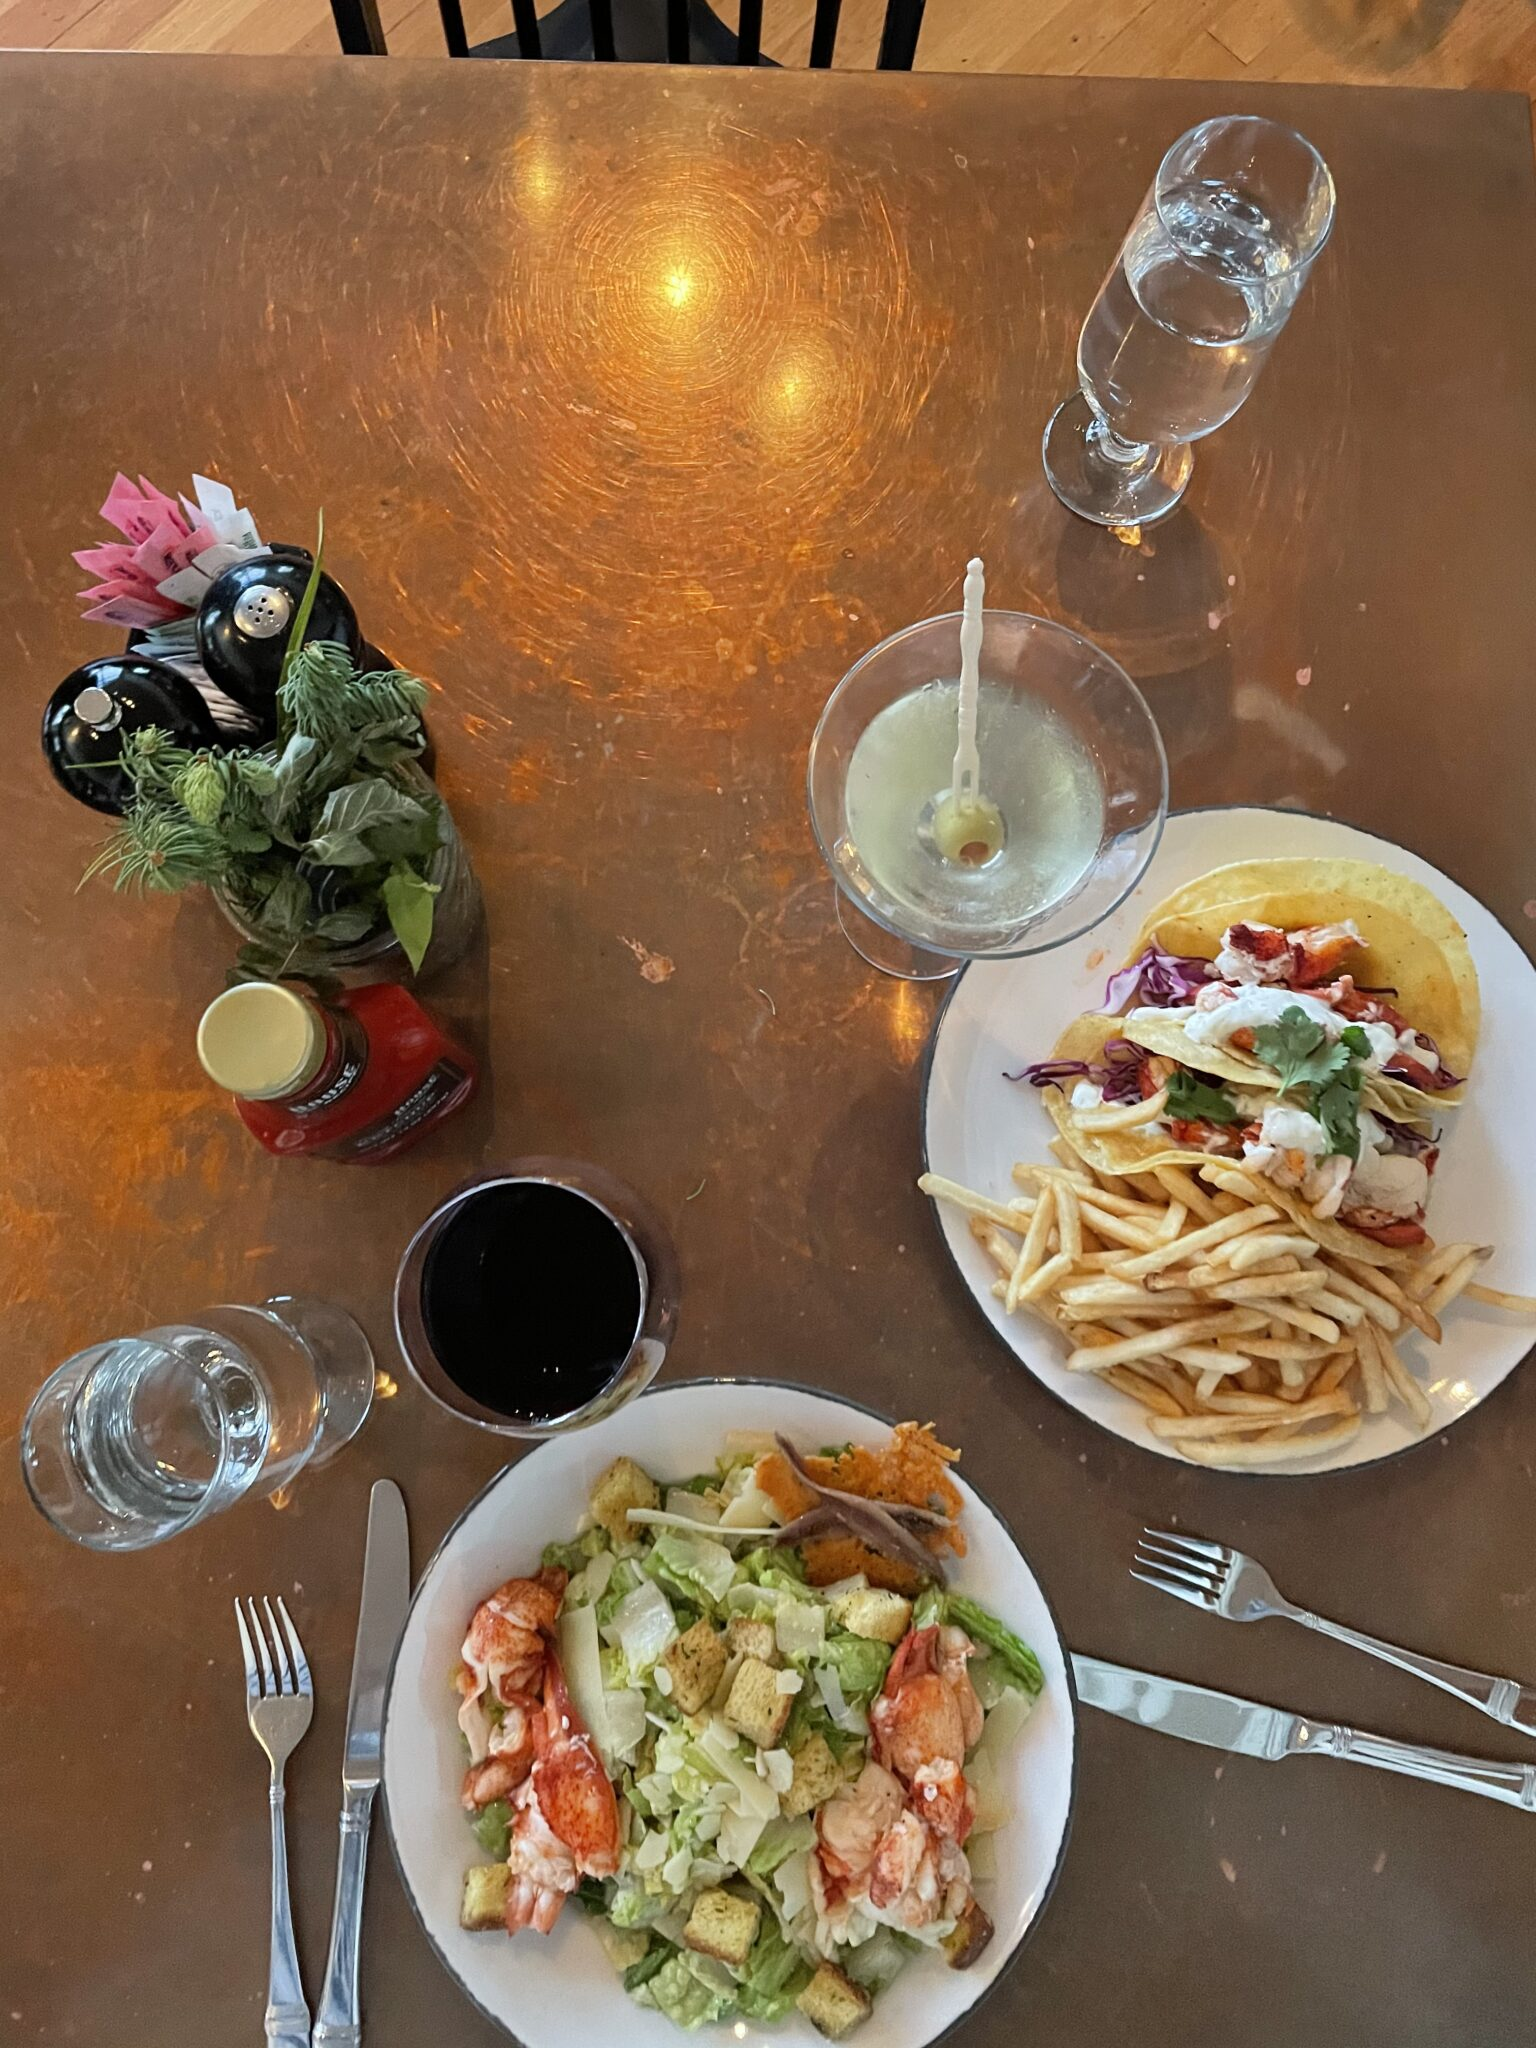 Lobster Ceasar Salad and Fish Tacos